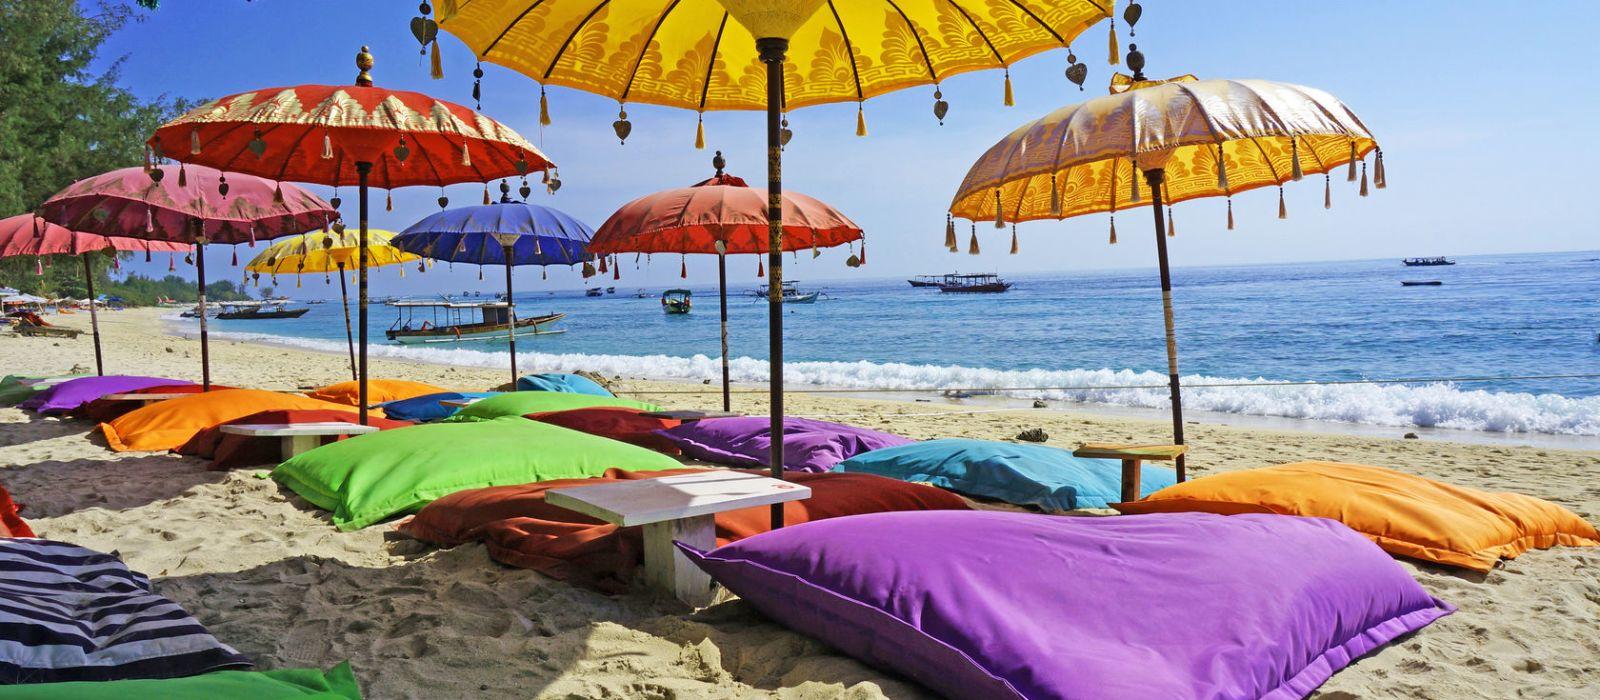 Indonesia: Island Hopping and Bali Tour Trip 4